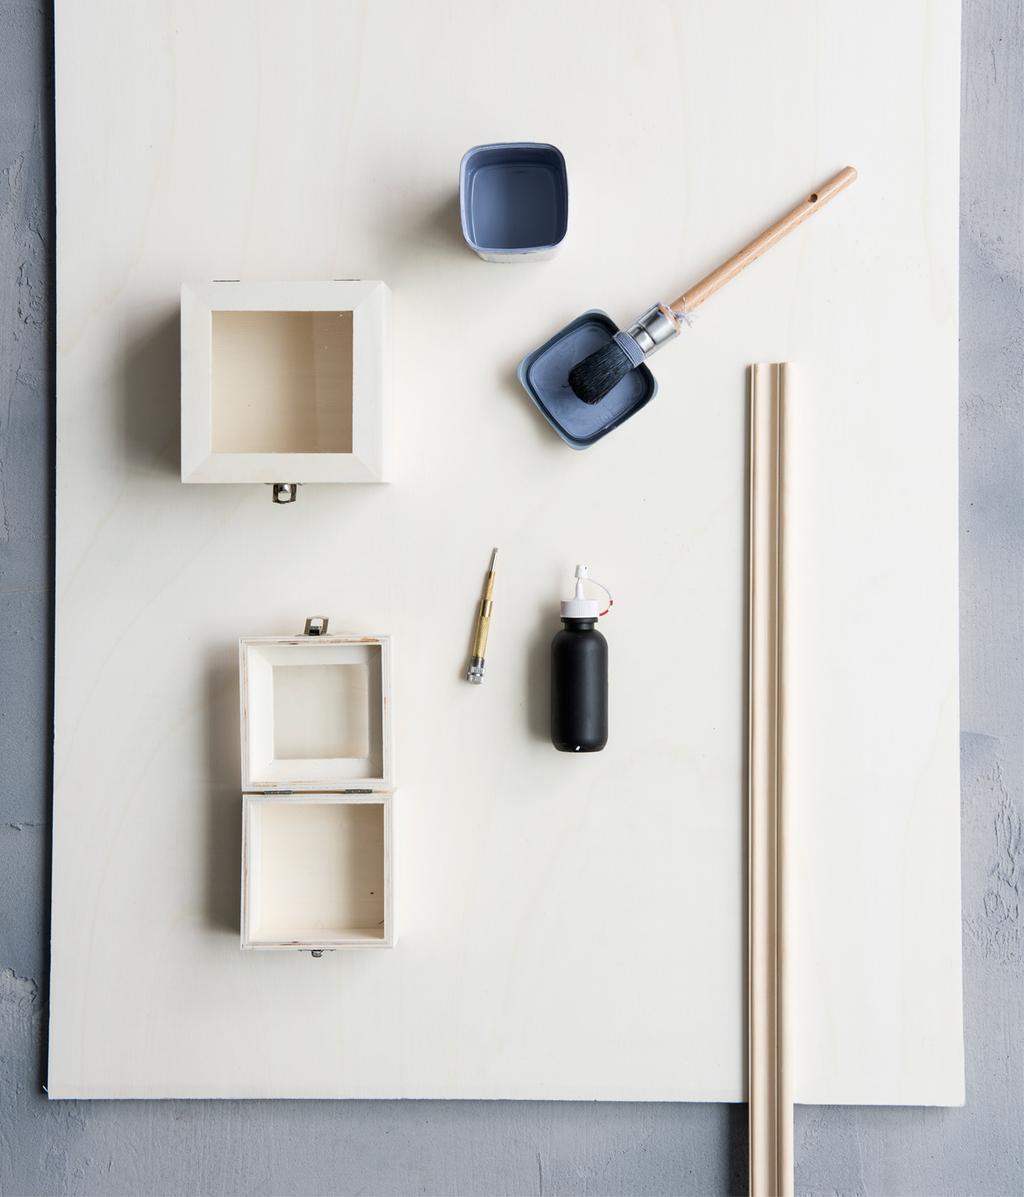 benodigdheden | DIY | vtwonen 08-2019